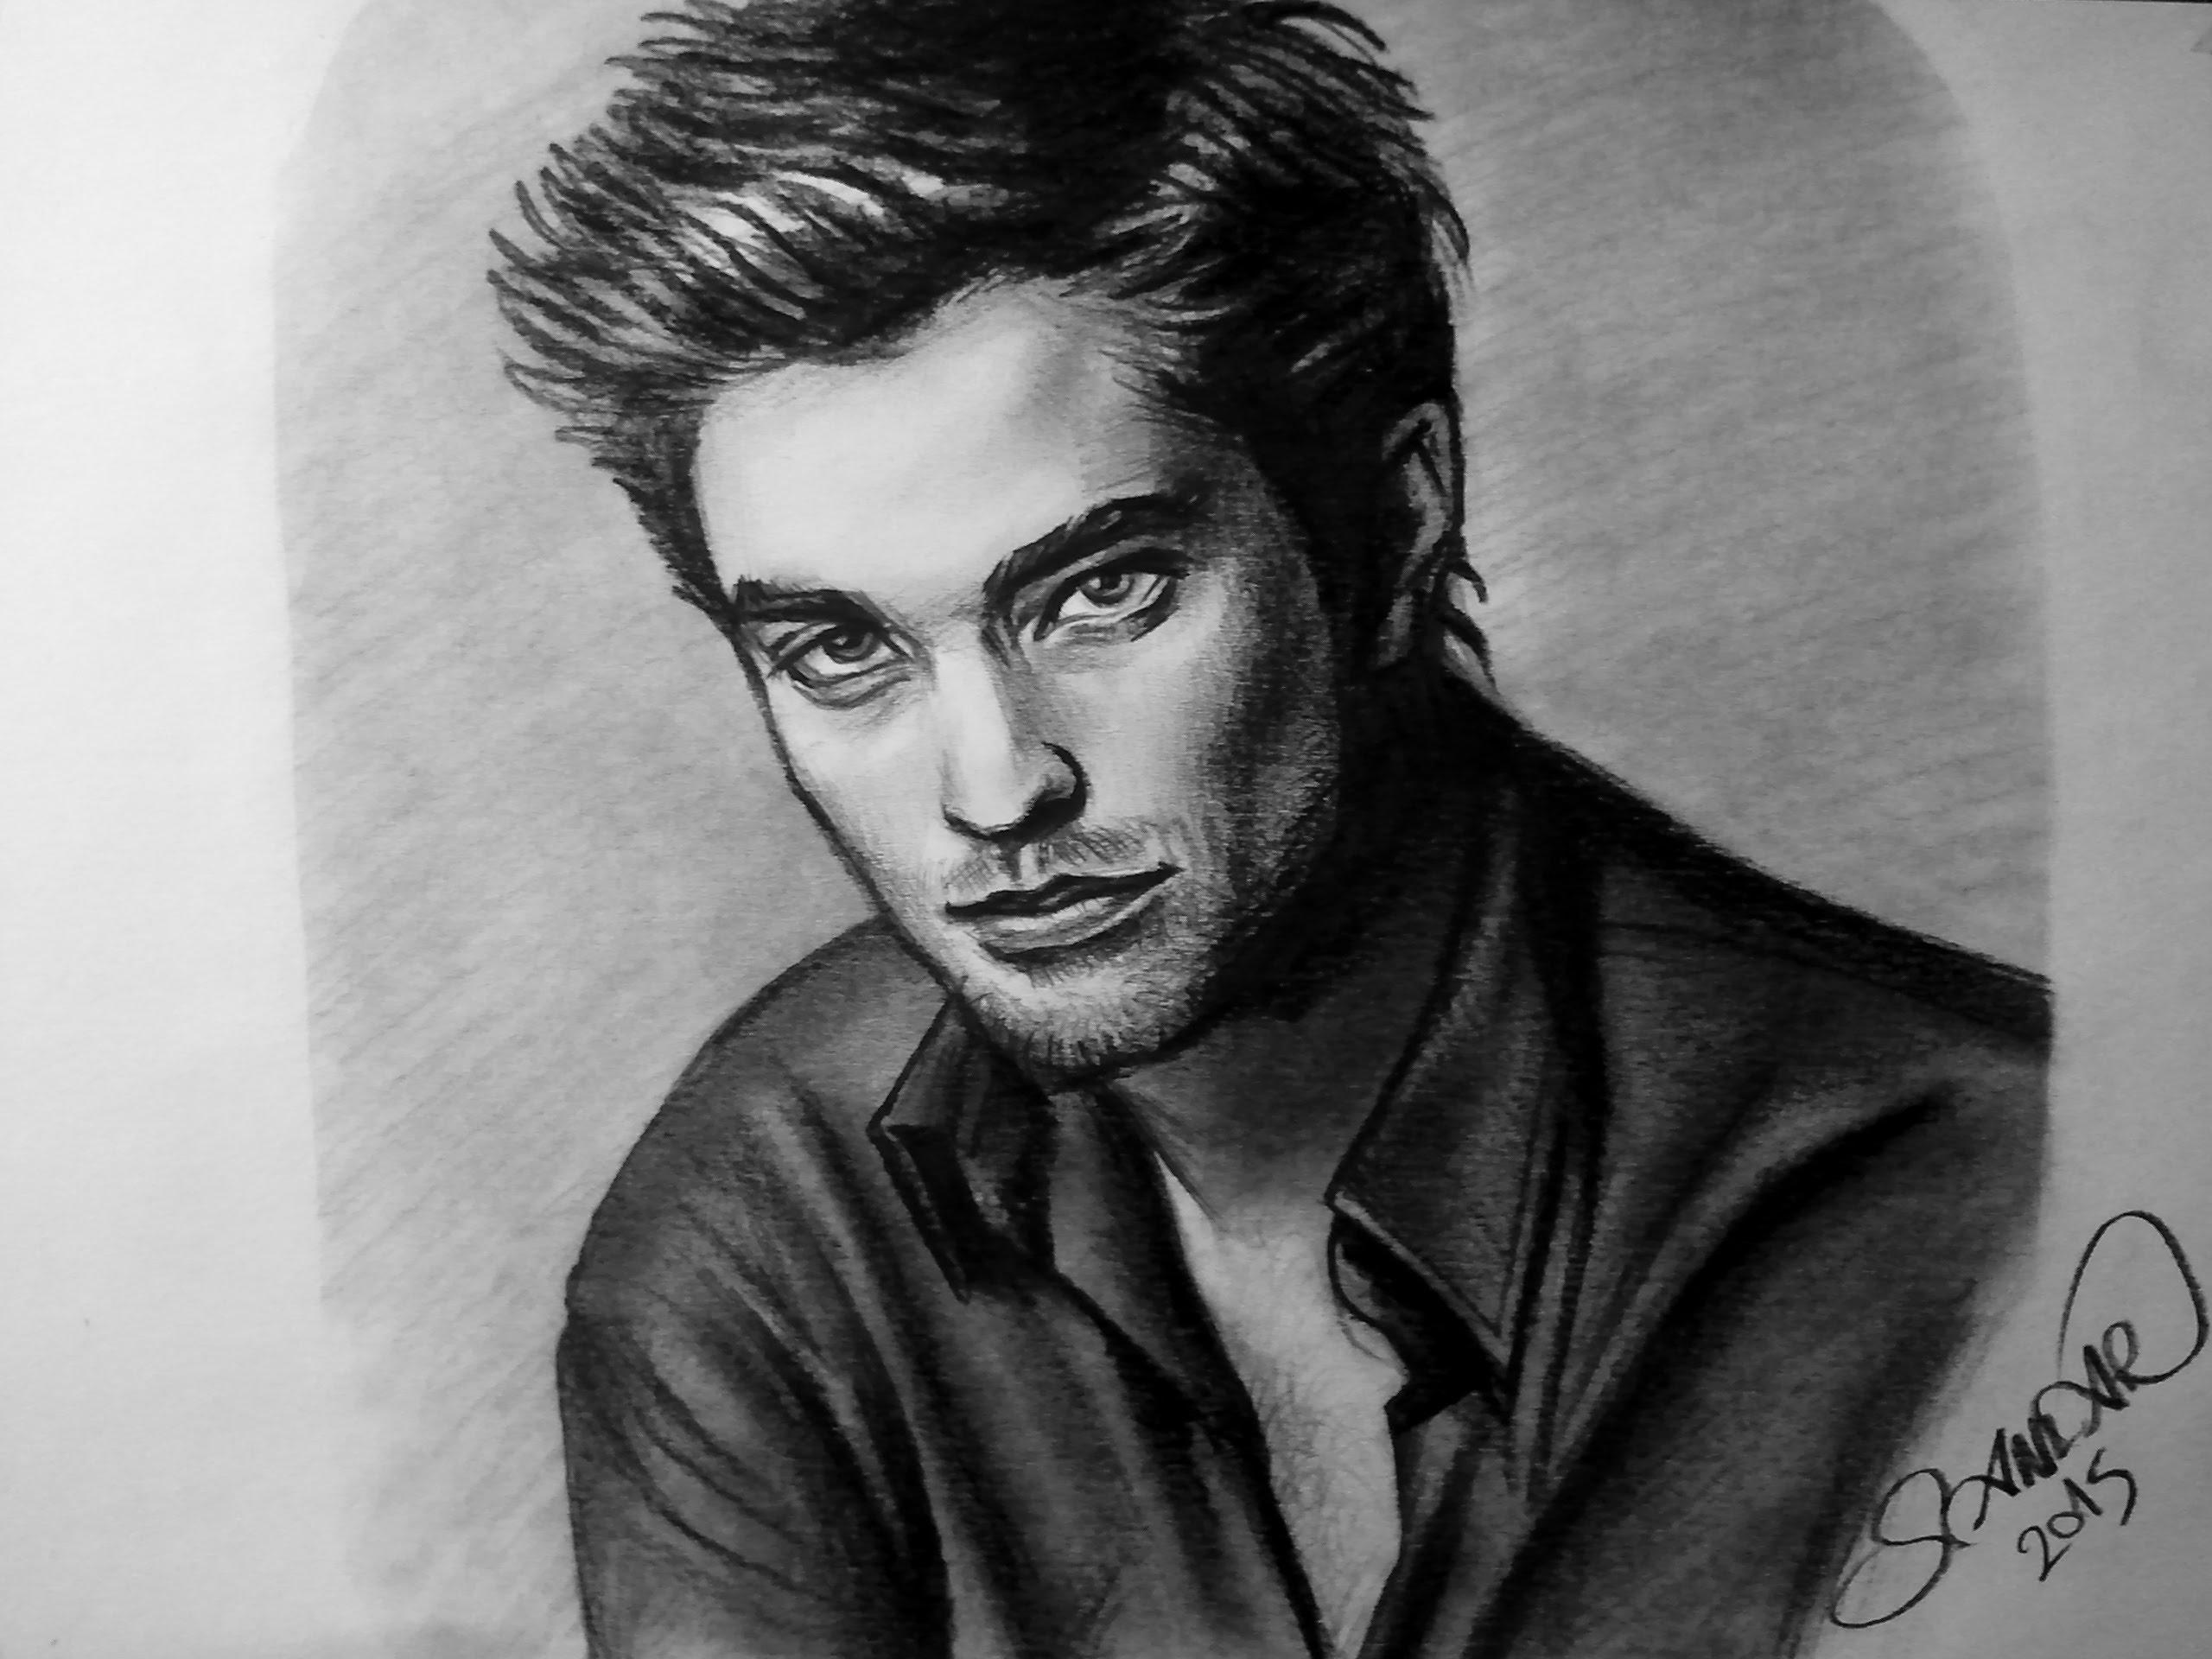 Drawn vampire robert pattinson Drawing Drawing Pattinson Robert Robert